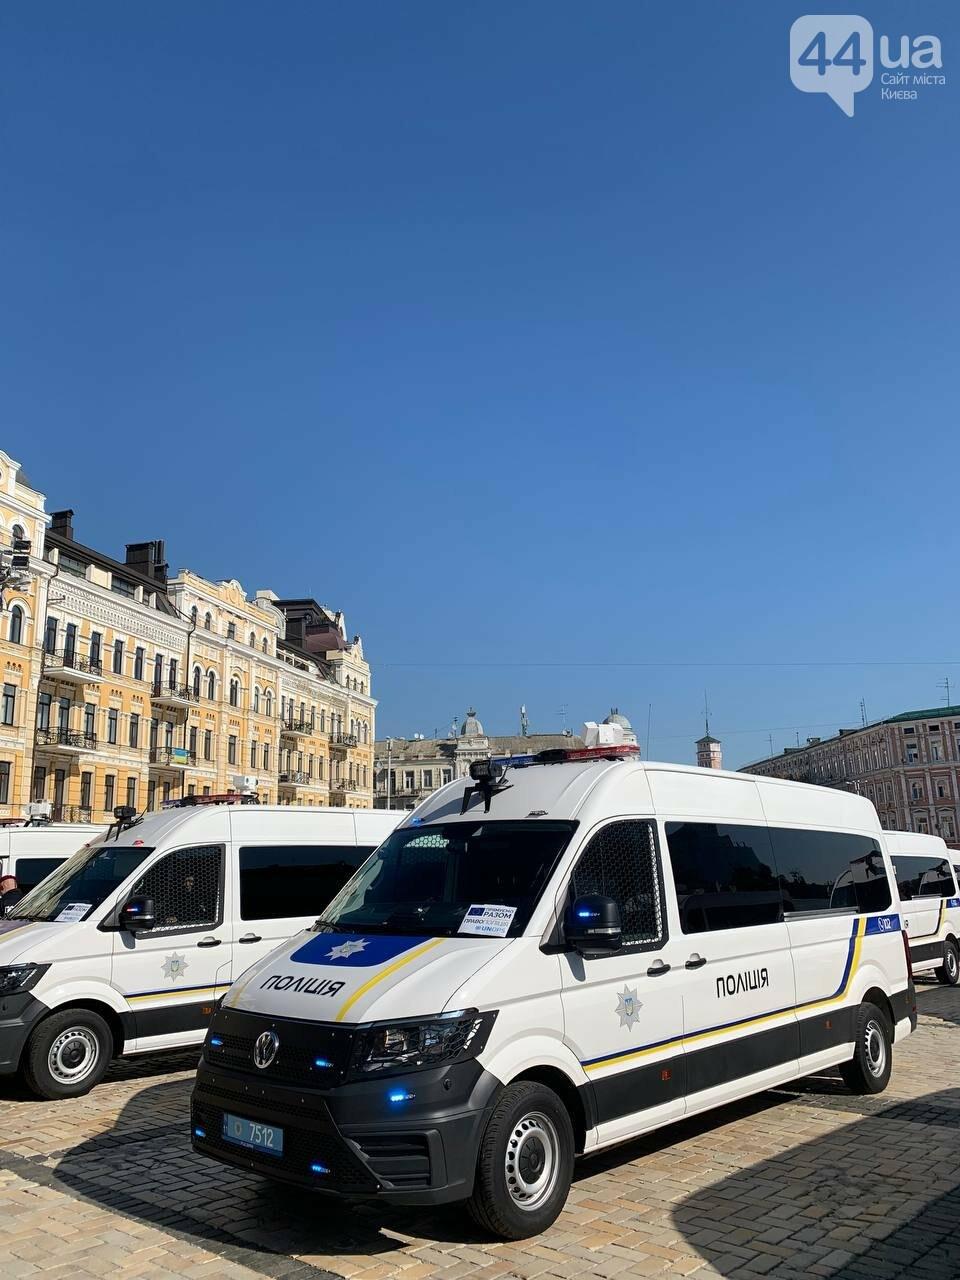 Почти 60 новых автомобилей: ЕС подарил Нацполиции технику на сумму 3,4 млн евро, - ФОТО, ВИДЕО, фото-14, 44.ua